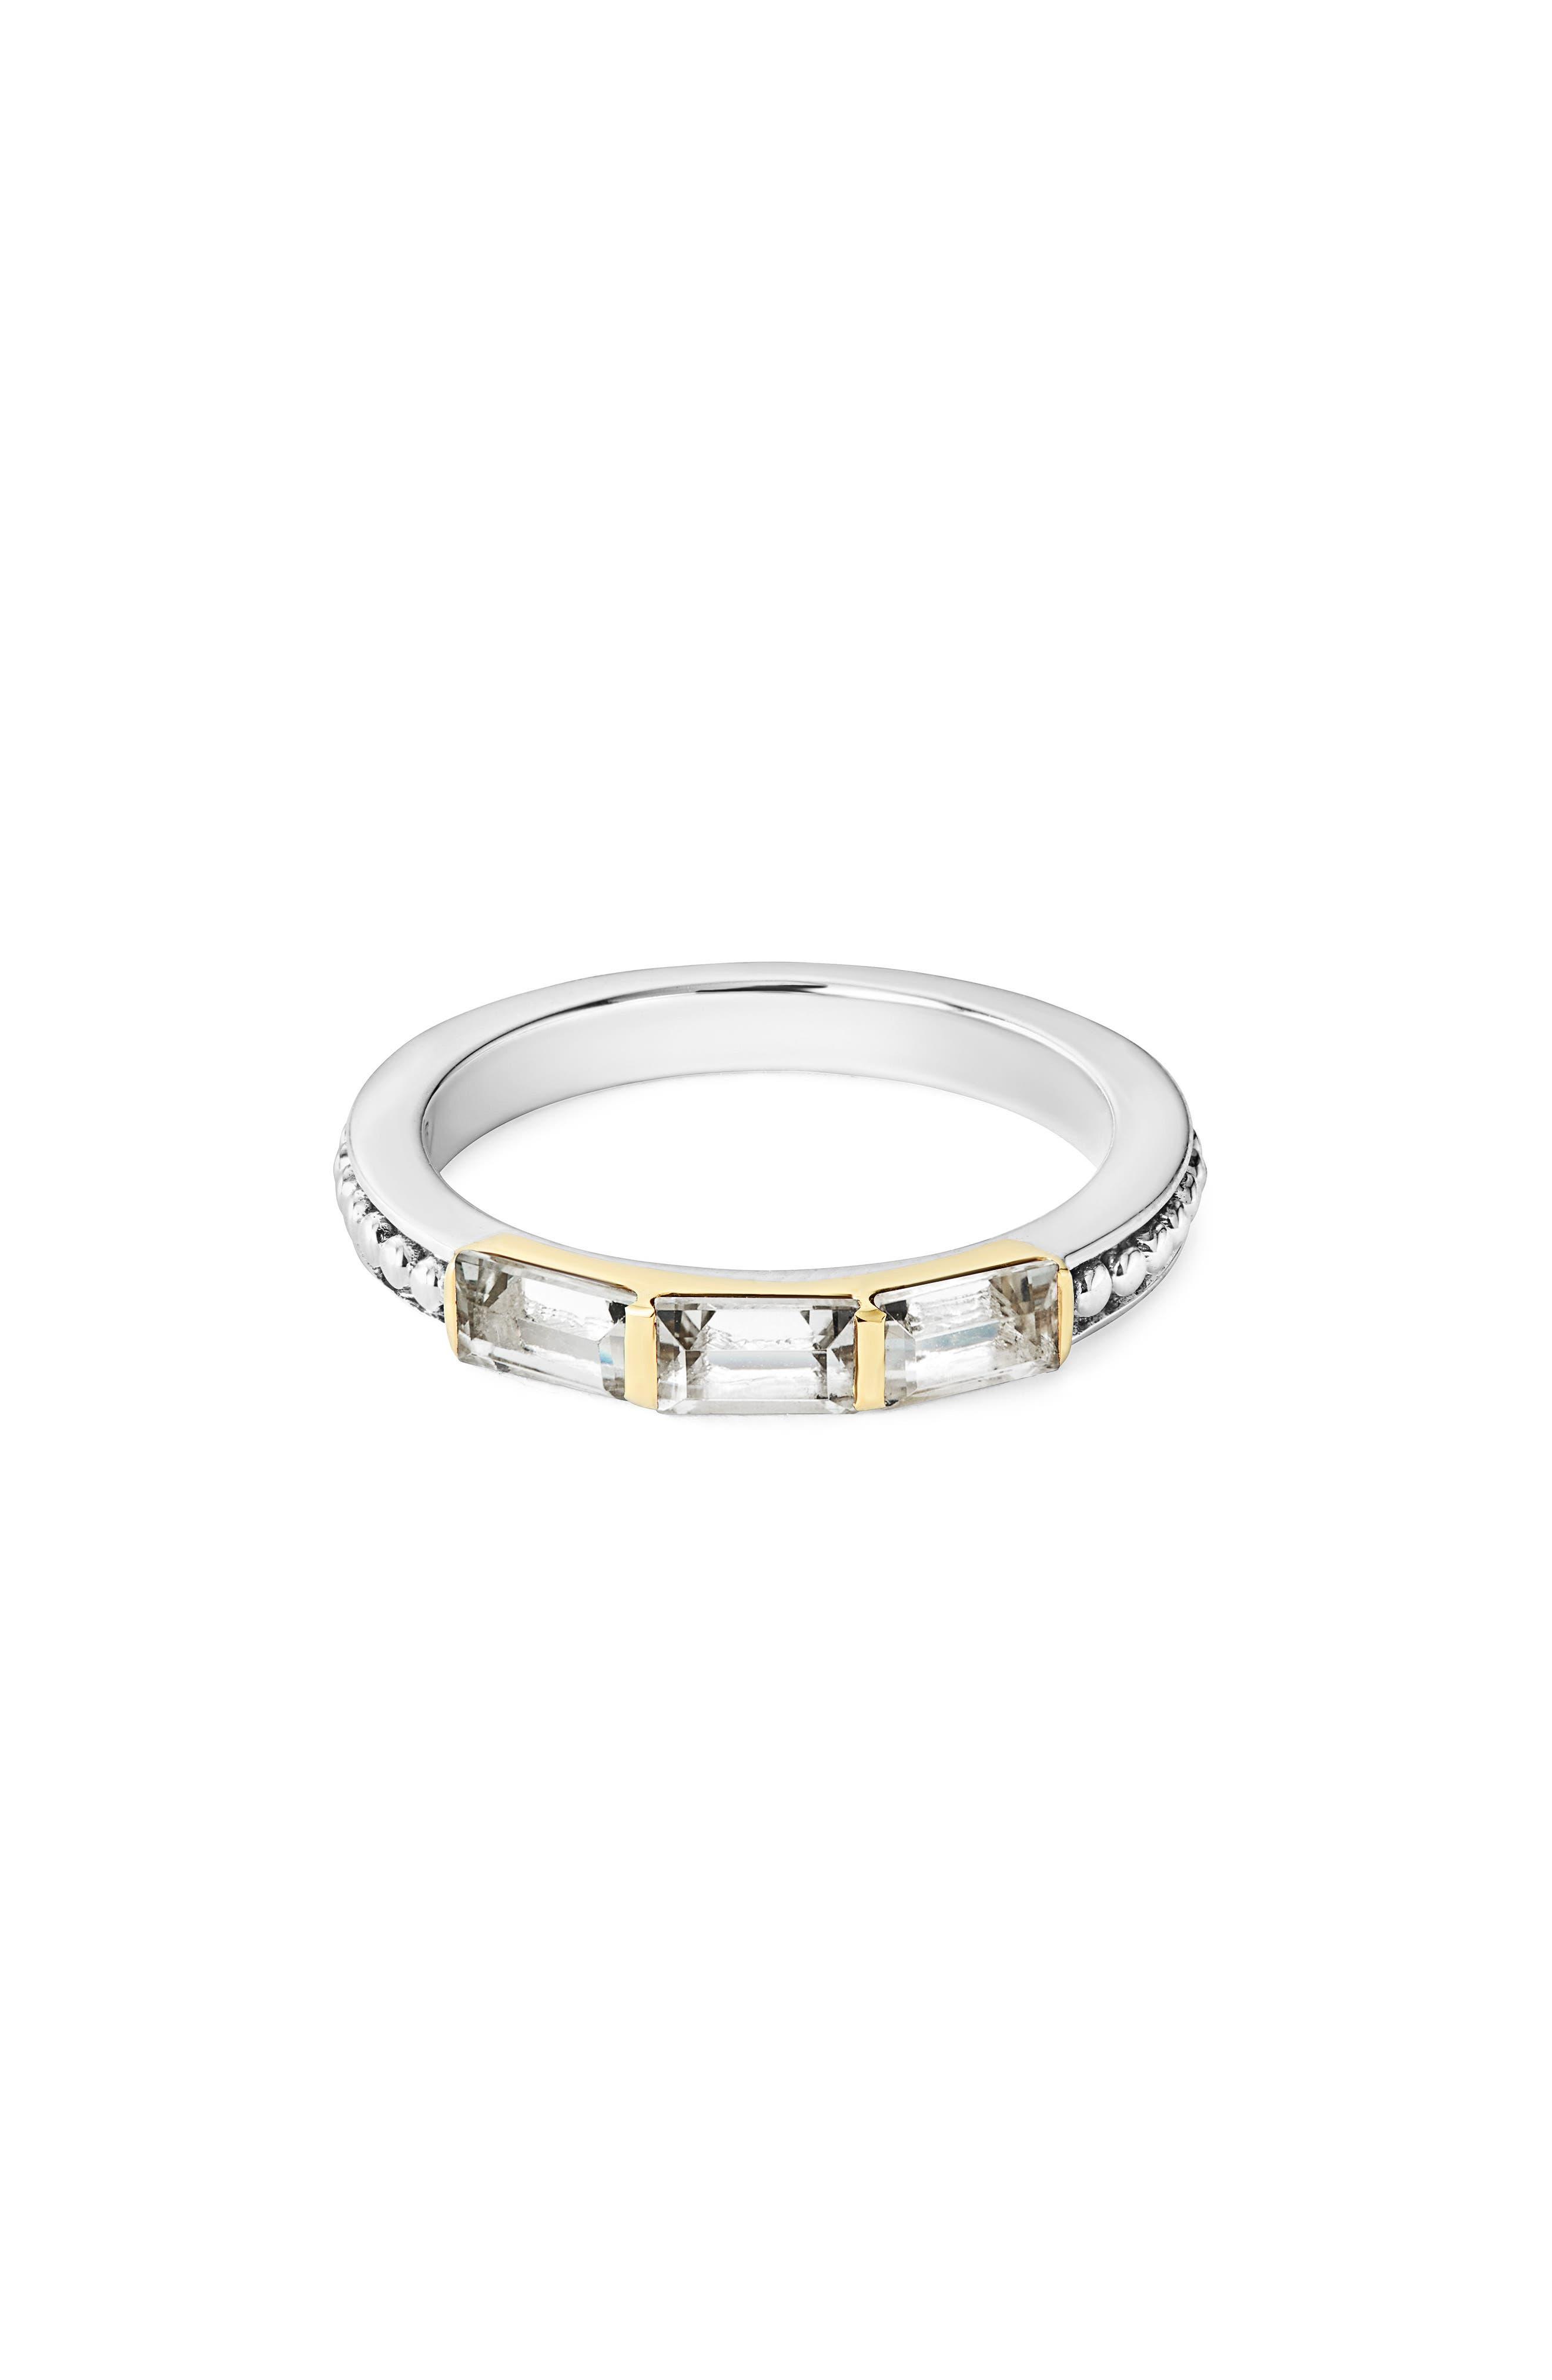 Gemstone Baguette Stackable Ring,                         Main,                         color, SILVER/ 18K GOLD/ WHITE TOPAZ